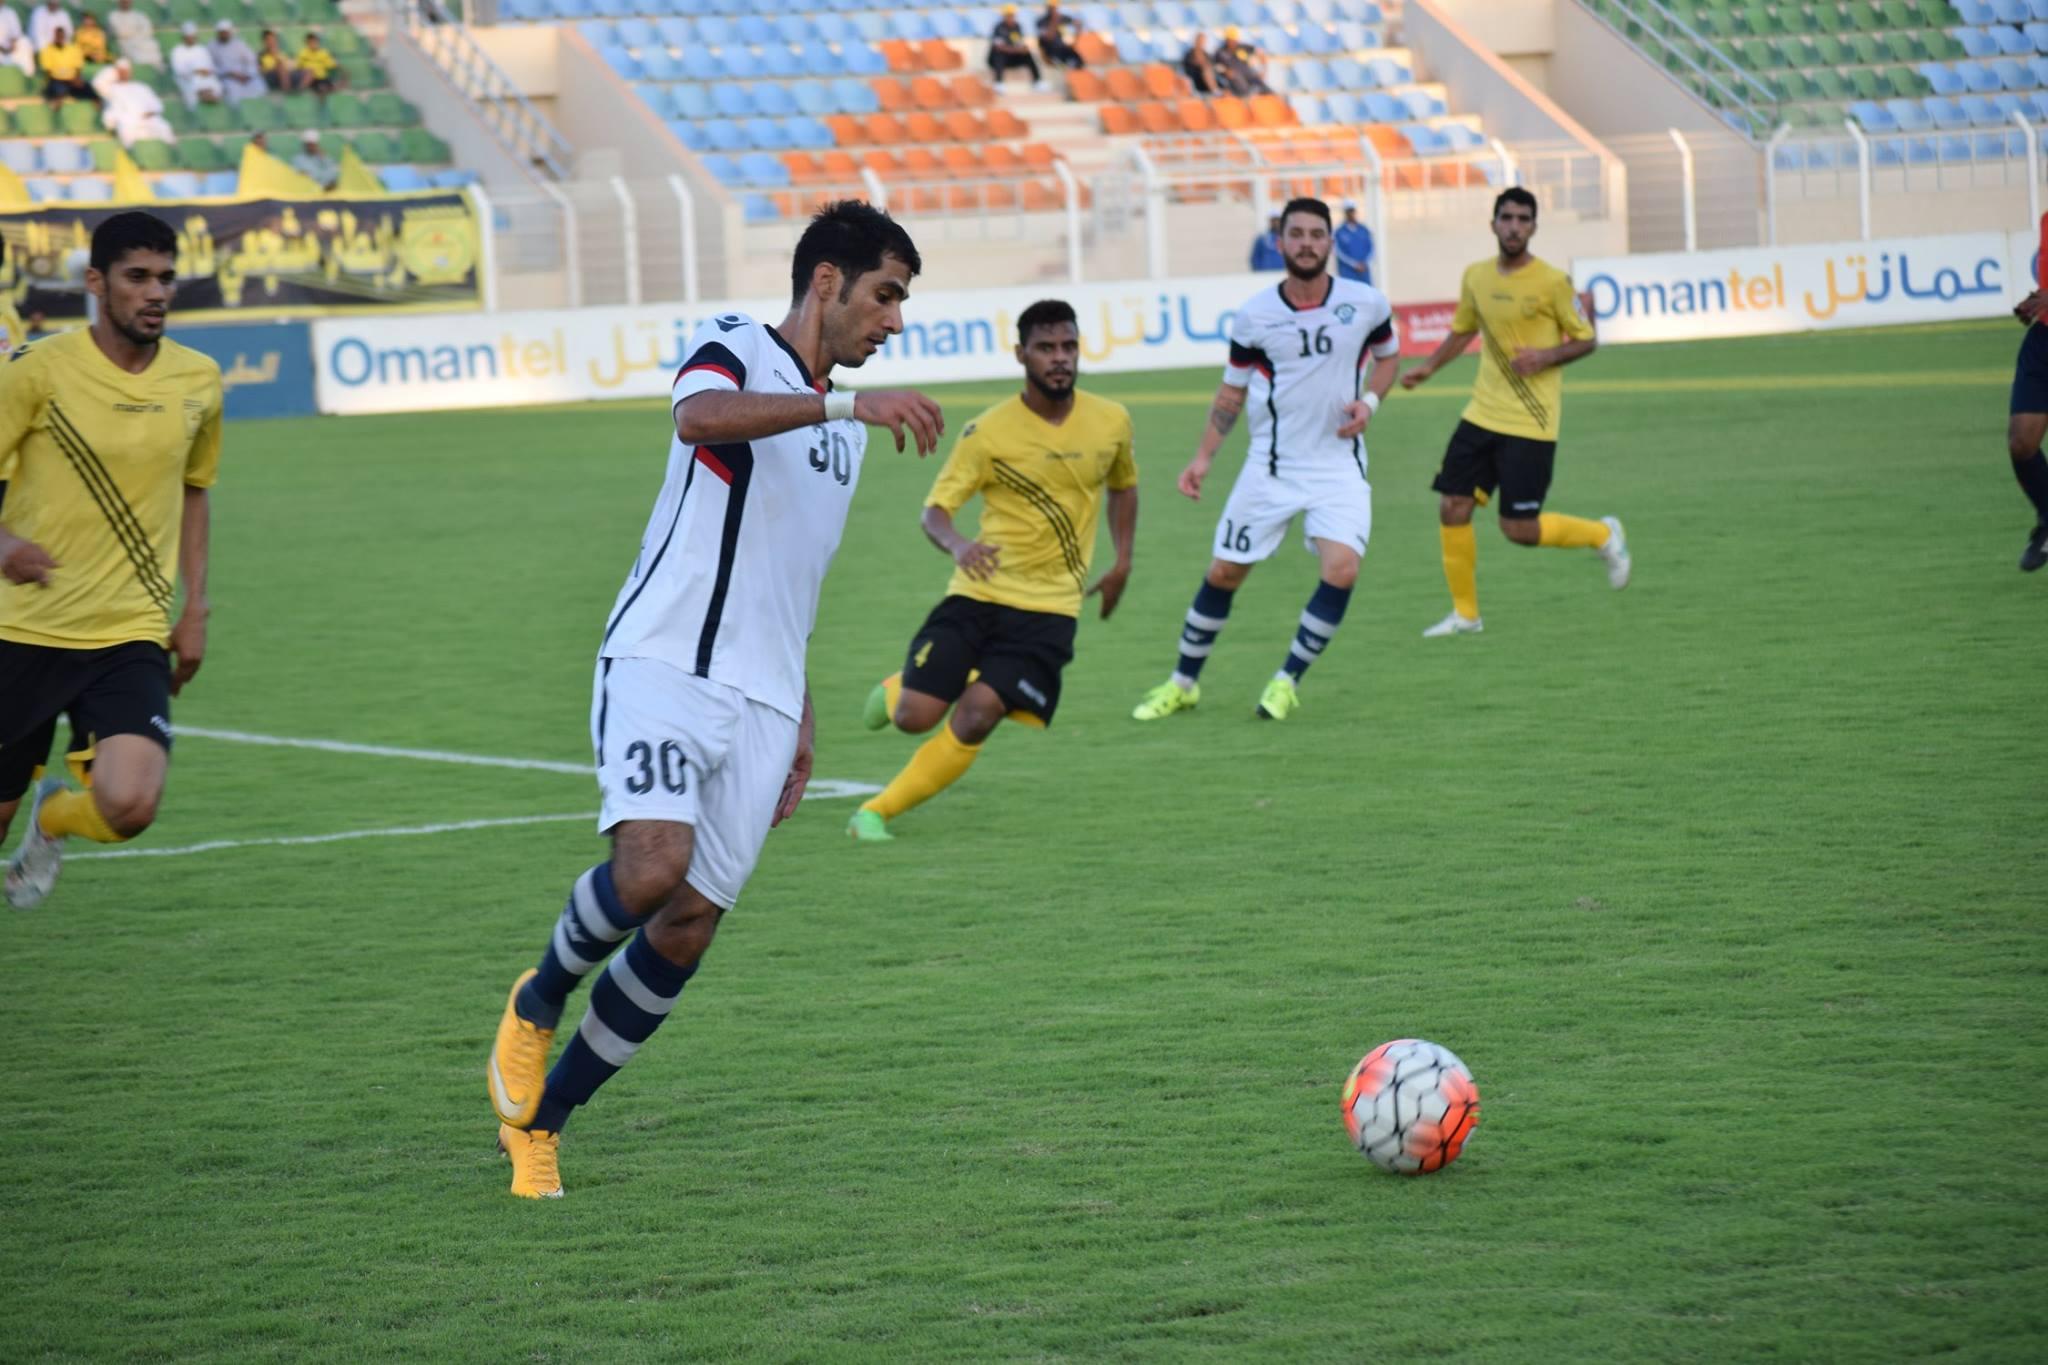 Oman Pro League game 2015